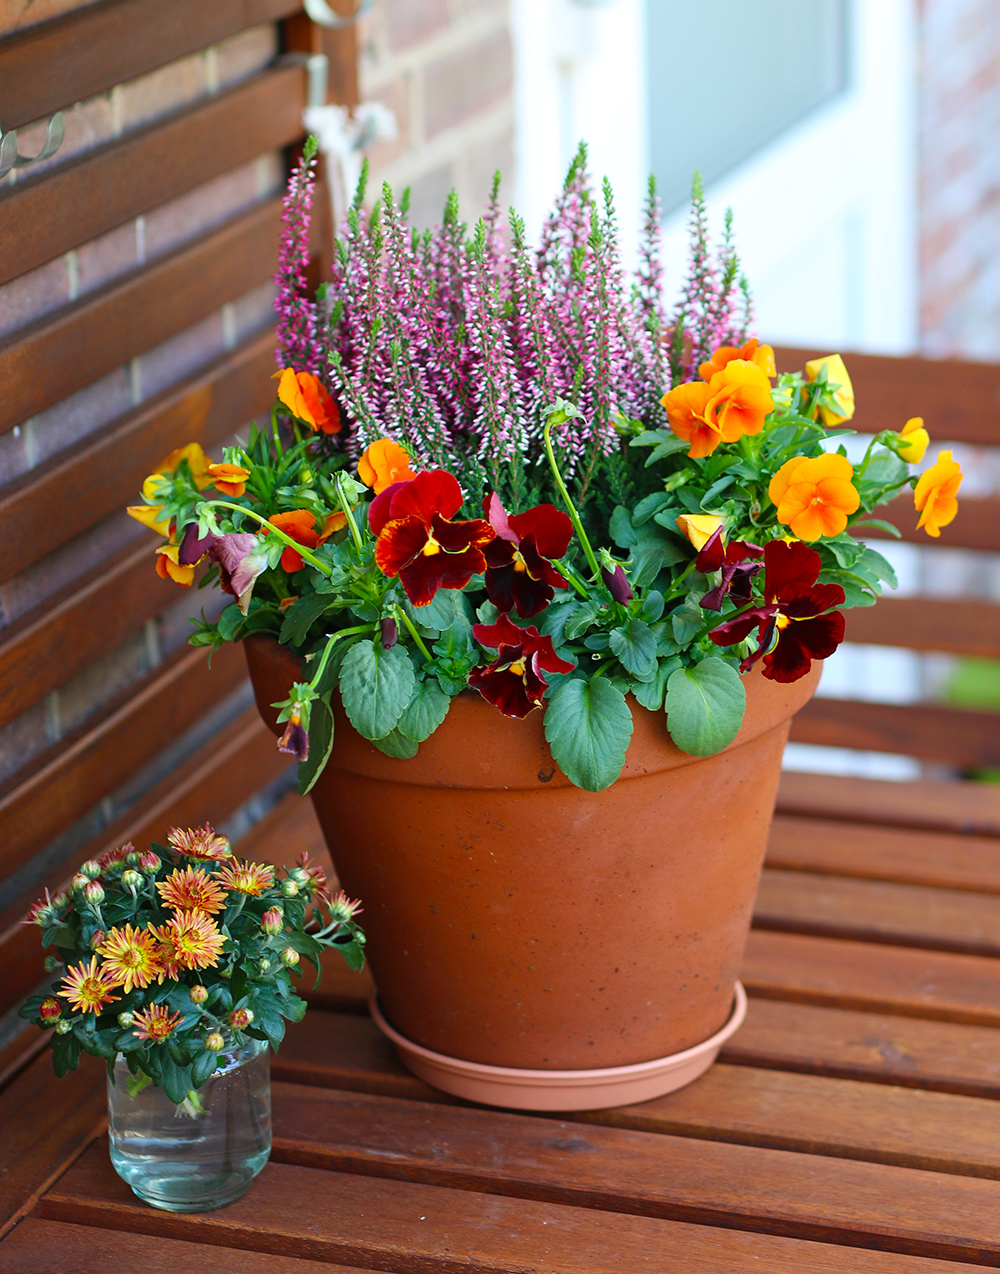 jardiniere-automne-bruyere-pensees5